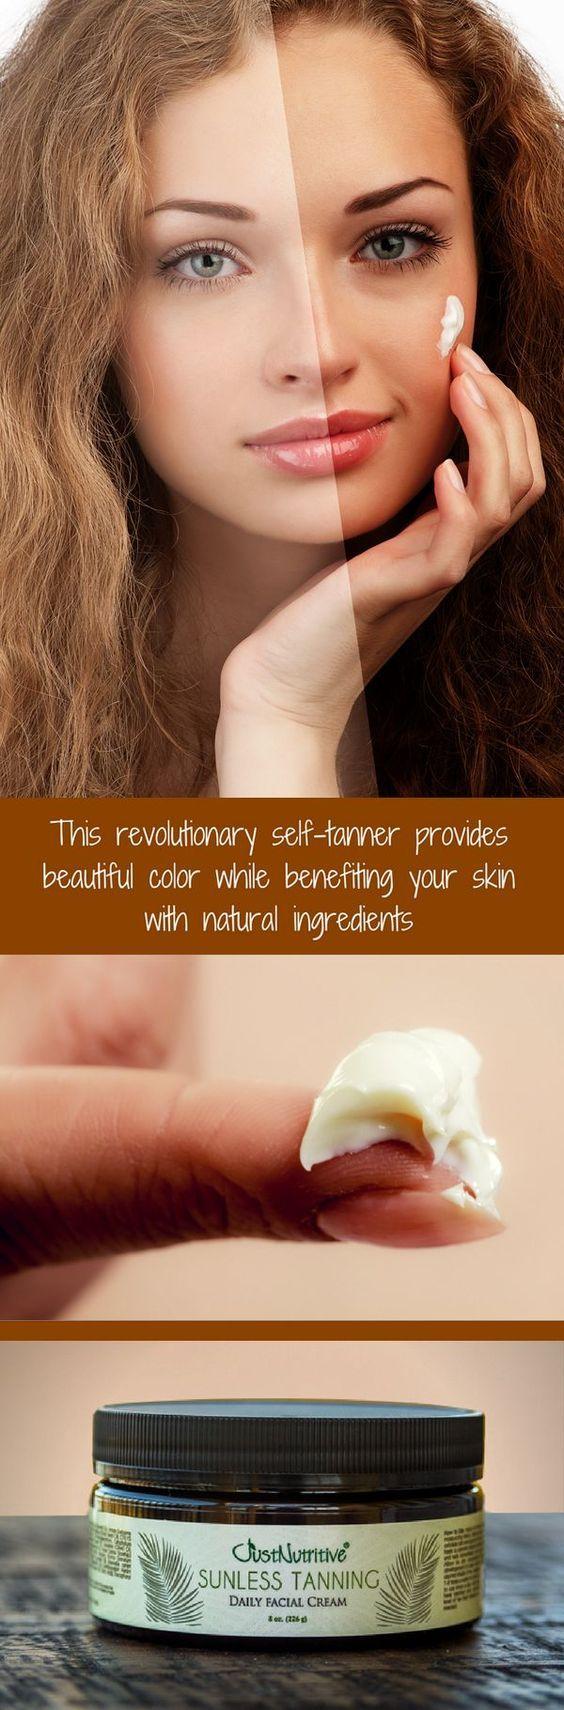 Sunless Tanning Daily Facial Cream Tanning skin